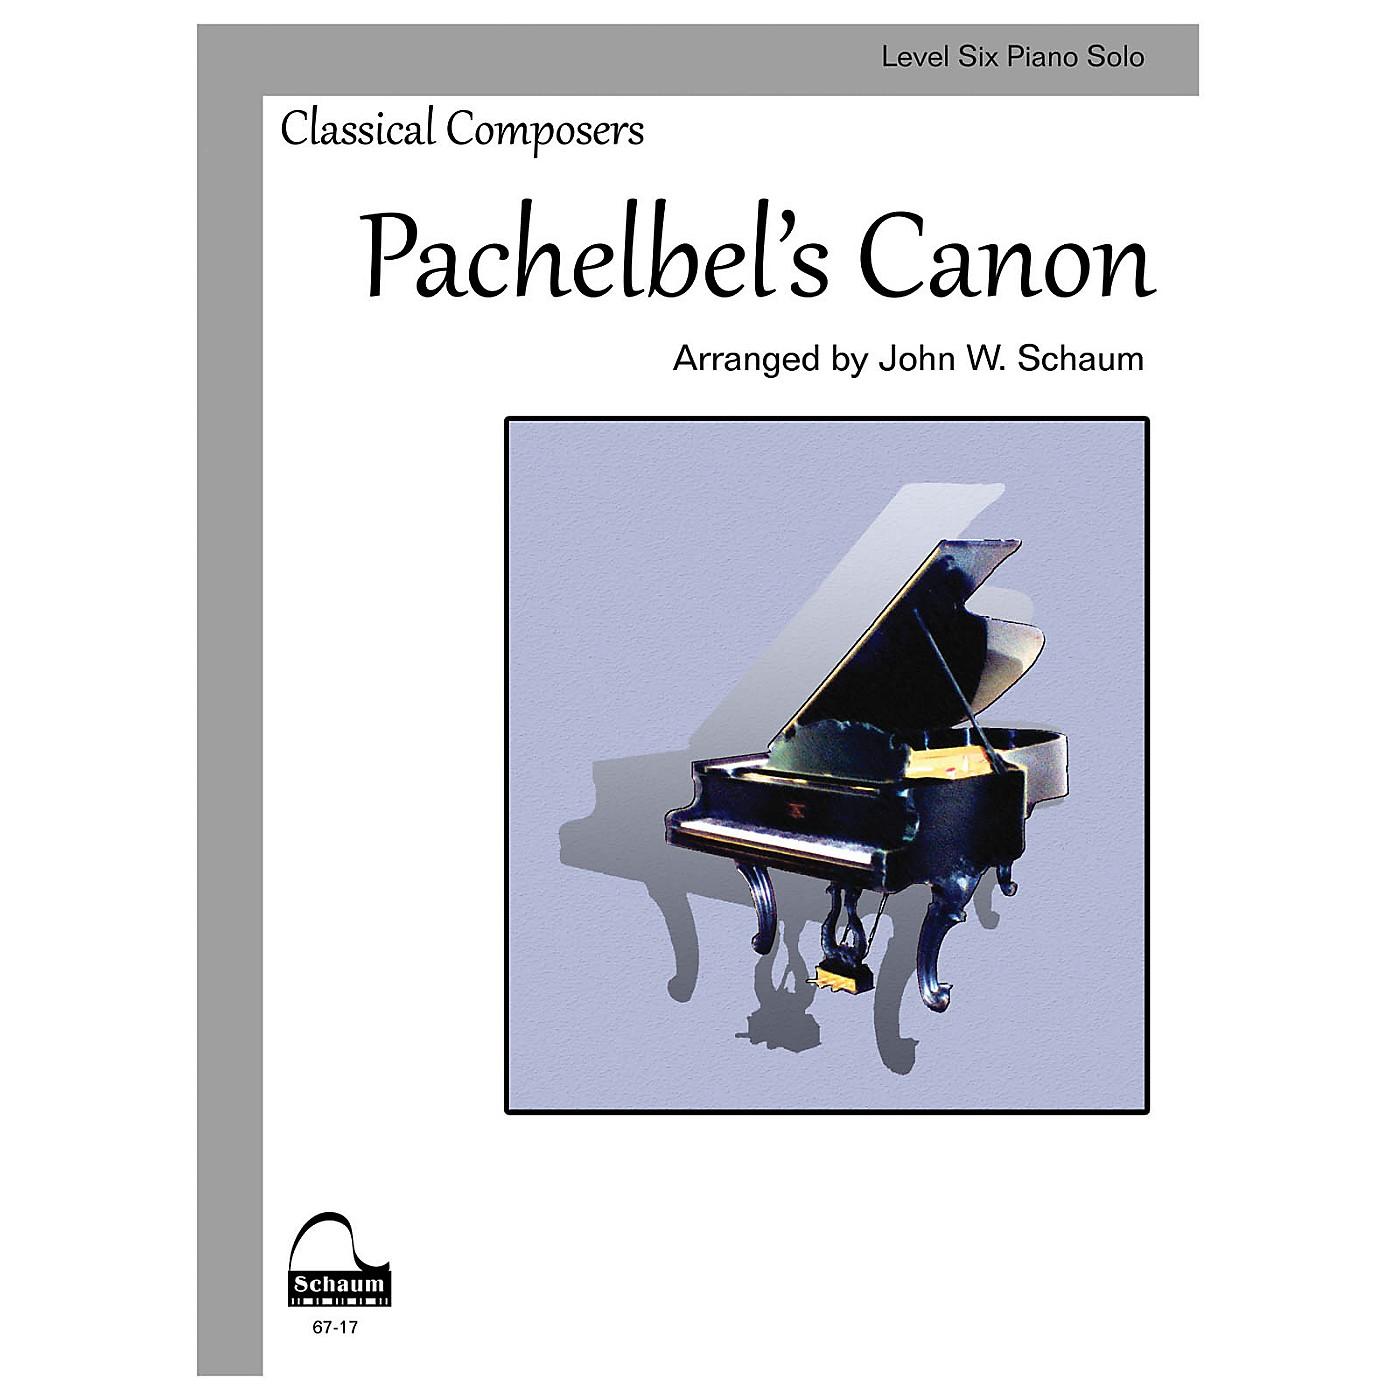 SCHAUM Pachelbel's Canon (Schaum Level Six Piano Solo) Educational Piano Book by Johann Pachelbel thumbnail